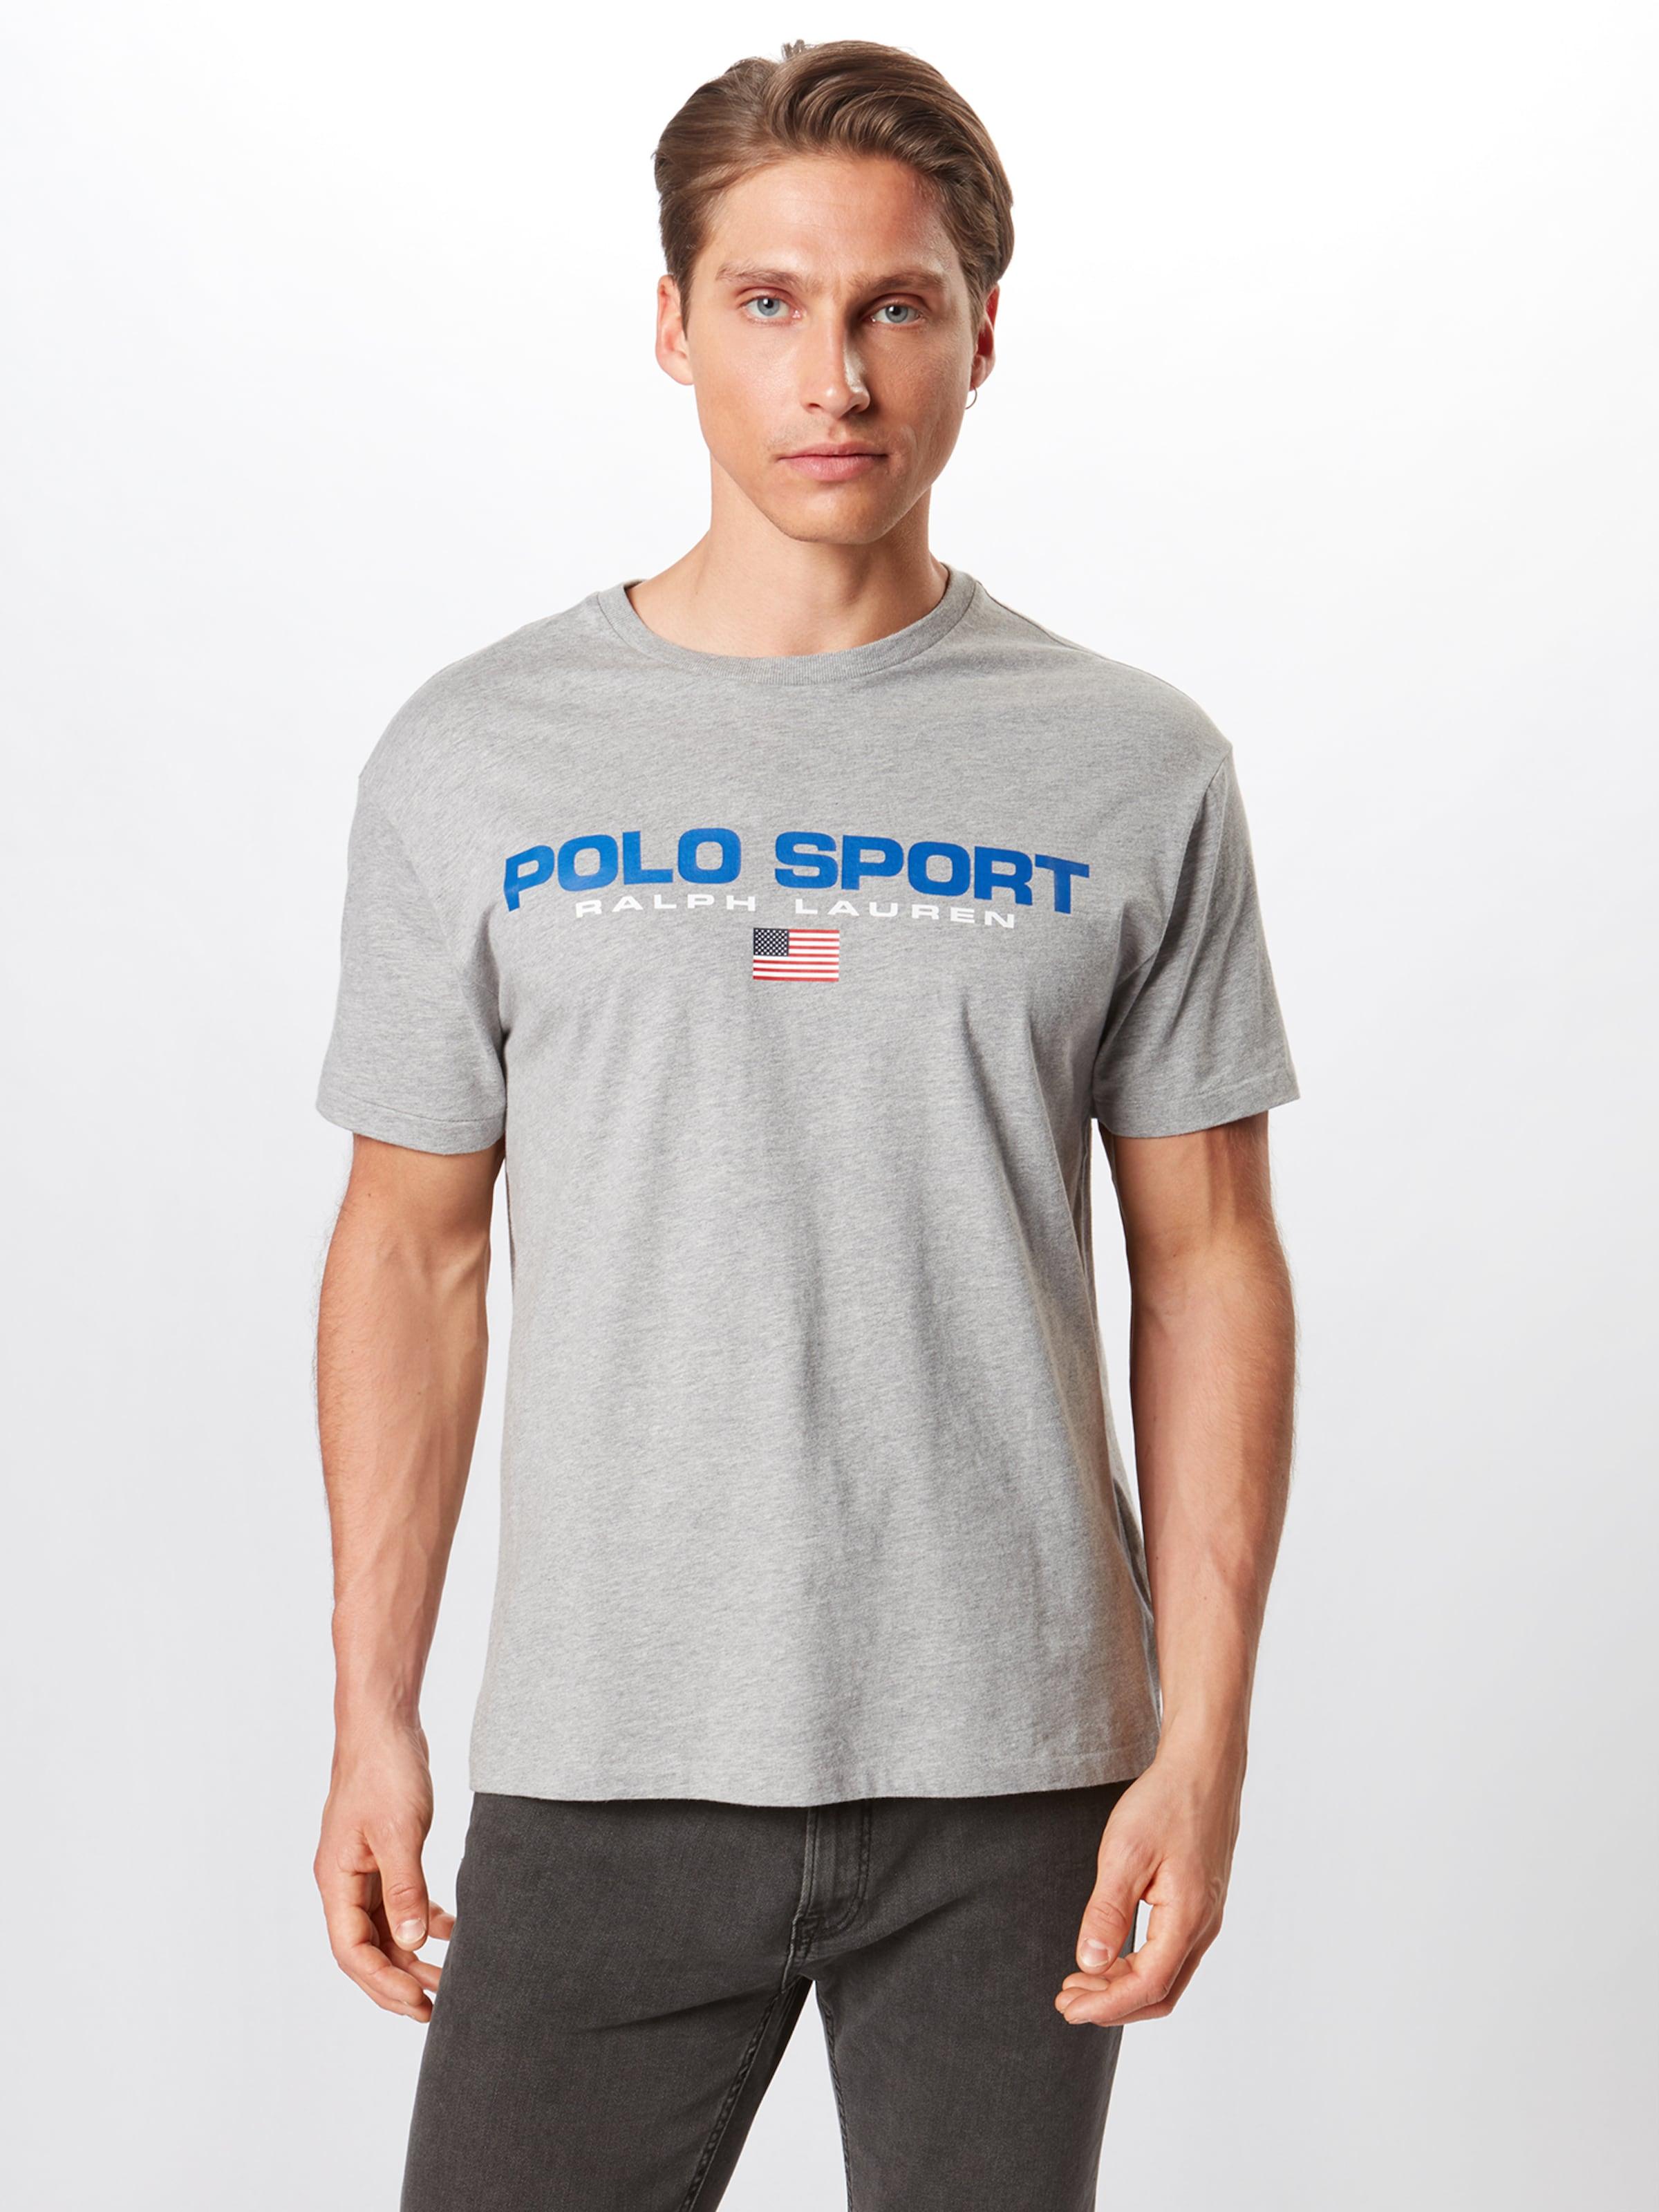 shirt En Lauren '26 1 Polo Jersey ssl tsh' Ralph Gris T N8vmn0w